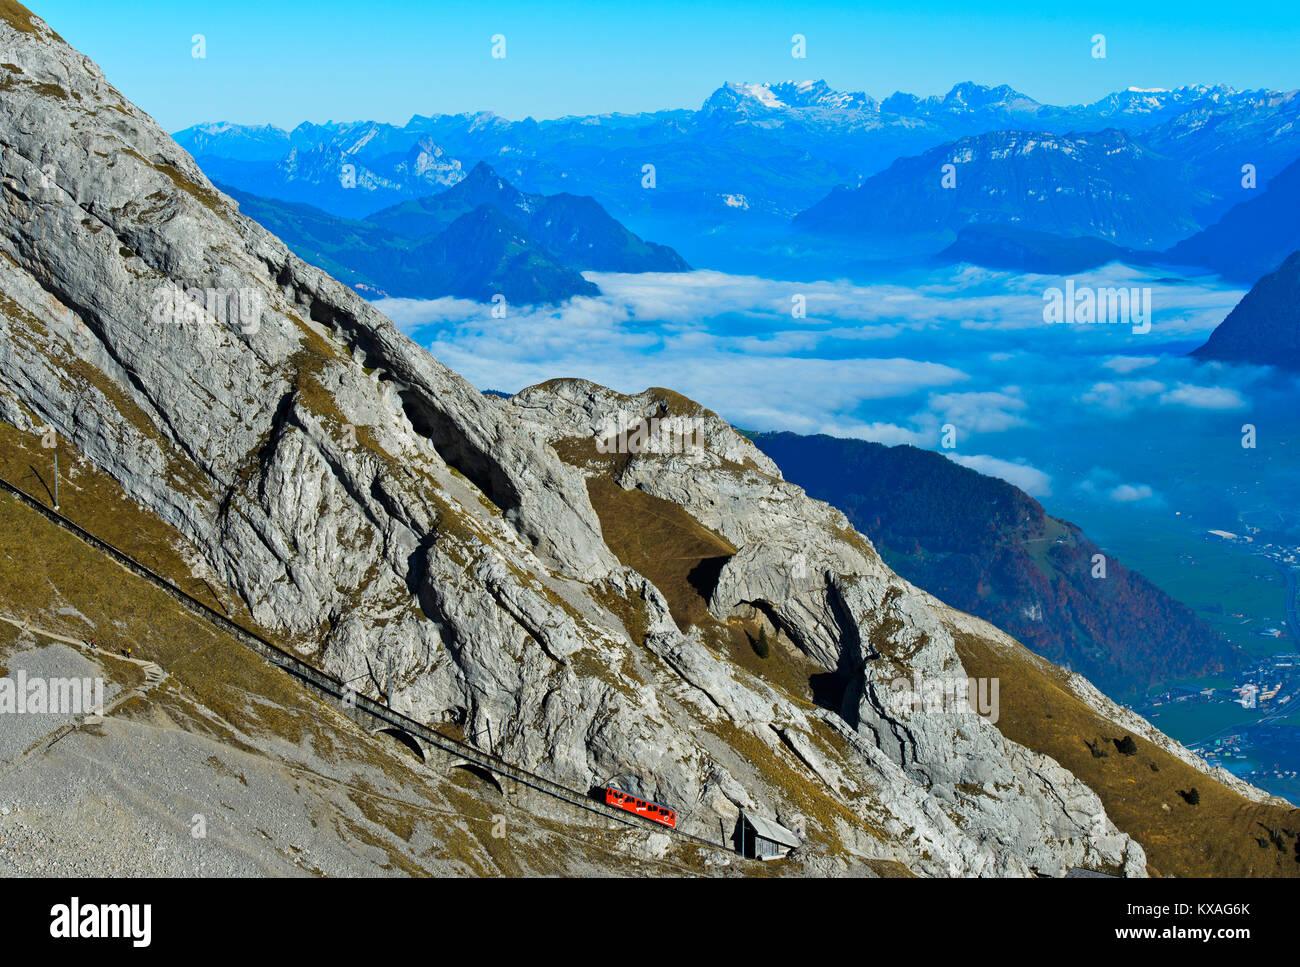 Red wagon of the Pilatus Railway at Mount Pilatus,mountain panorama in the background,Alpnachstad,Switzerland - Stock Image